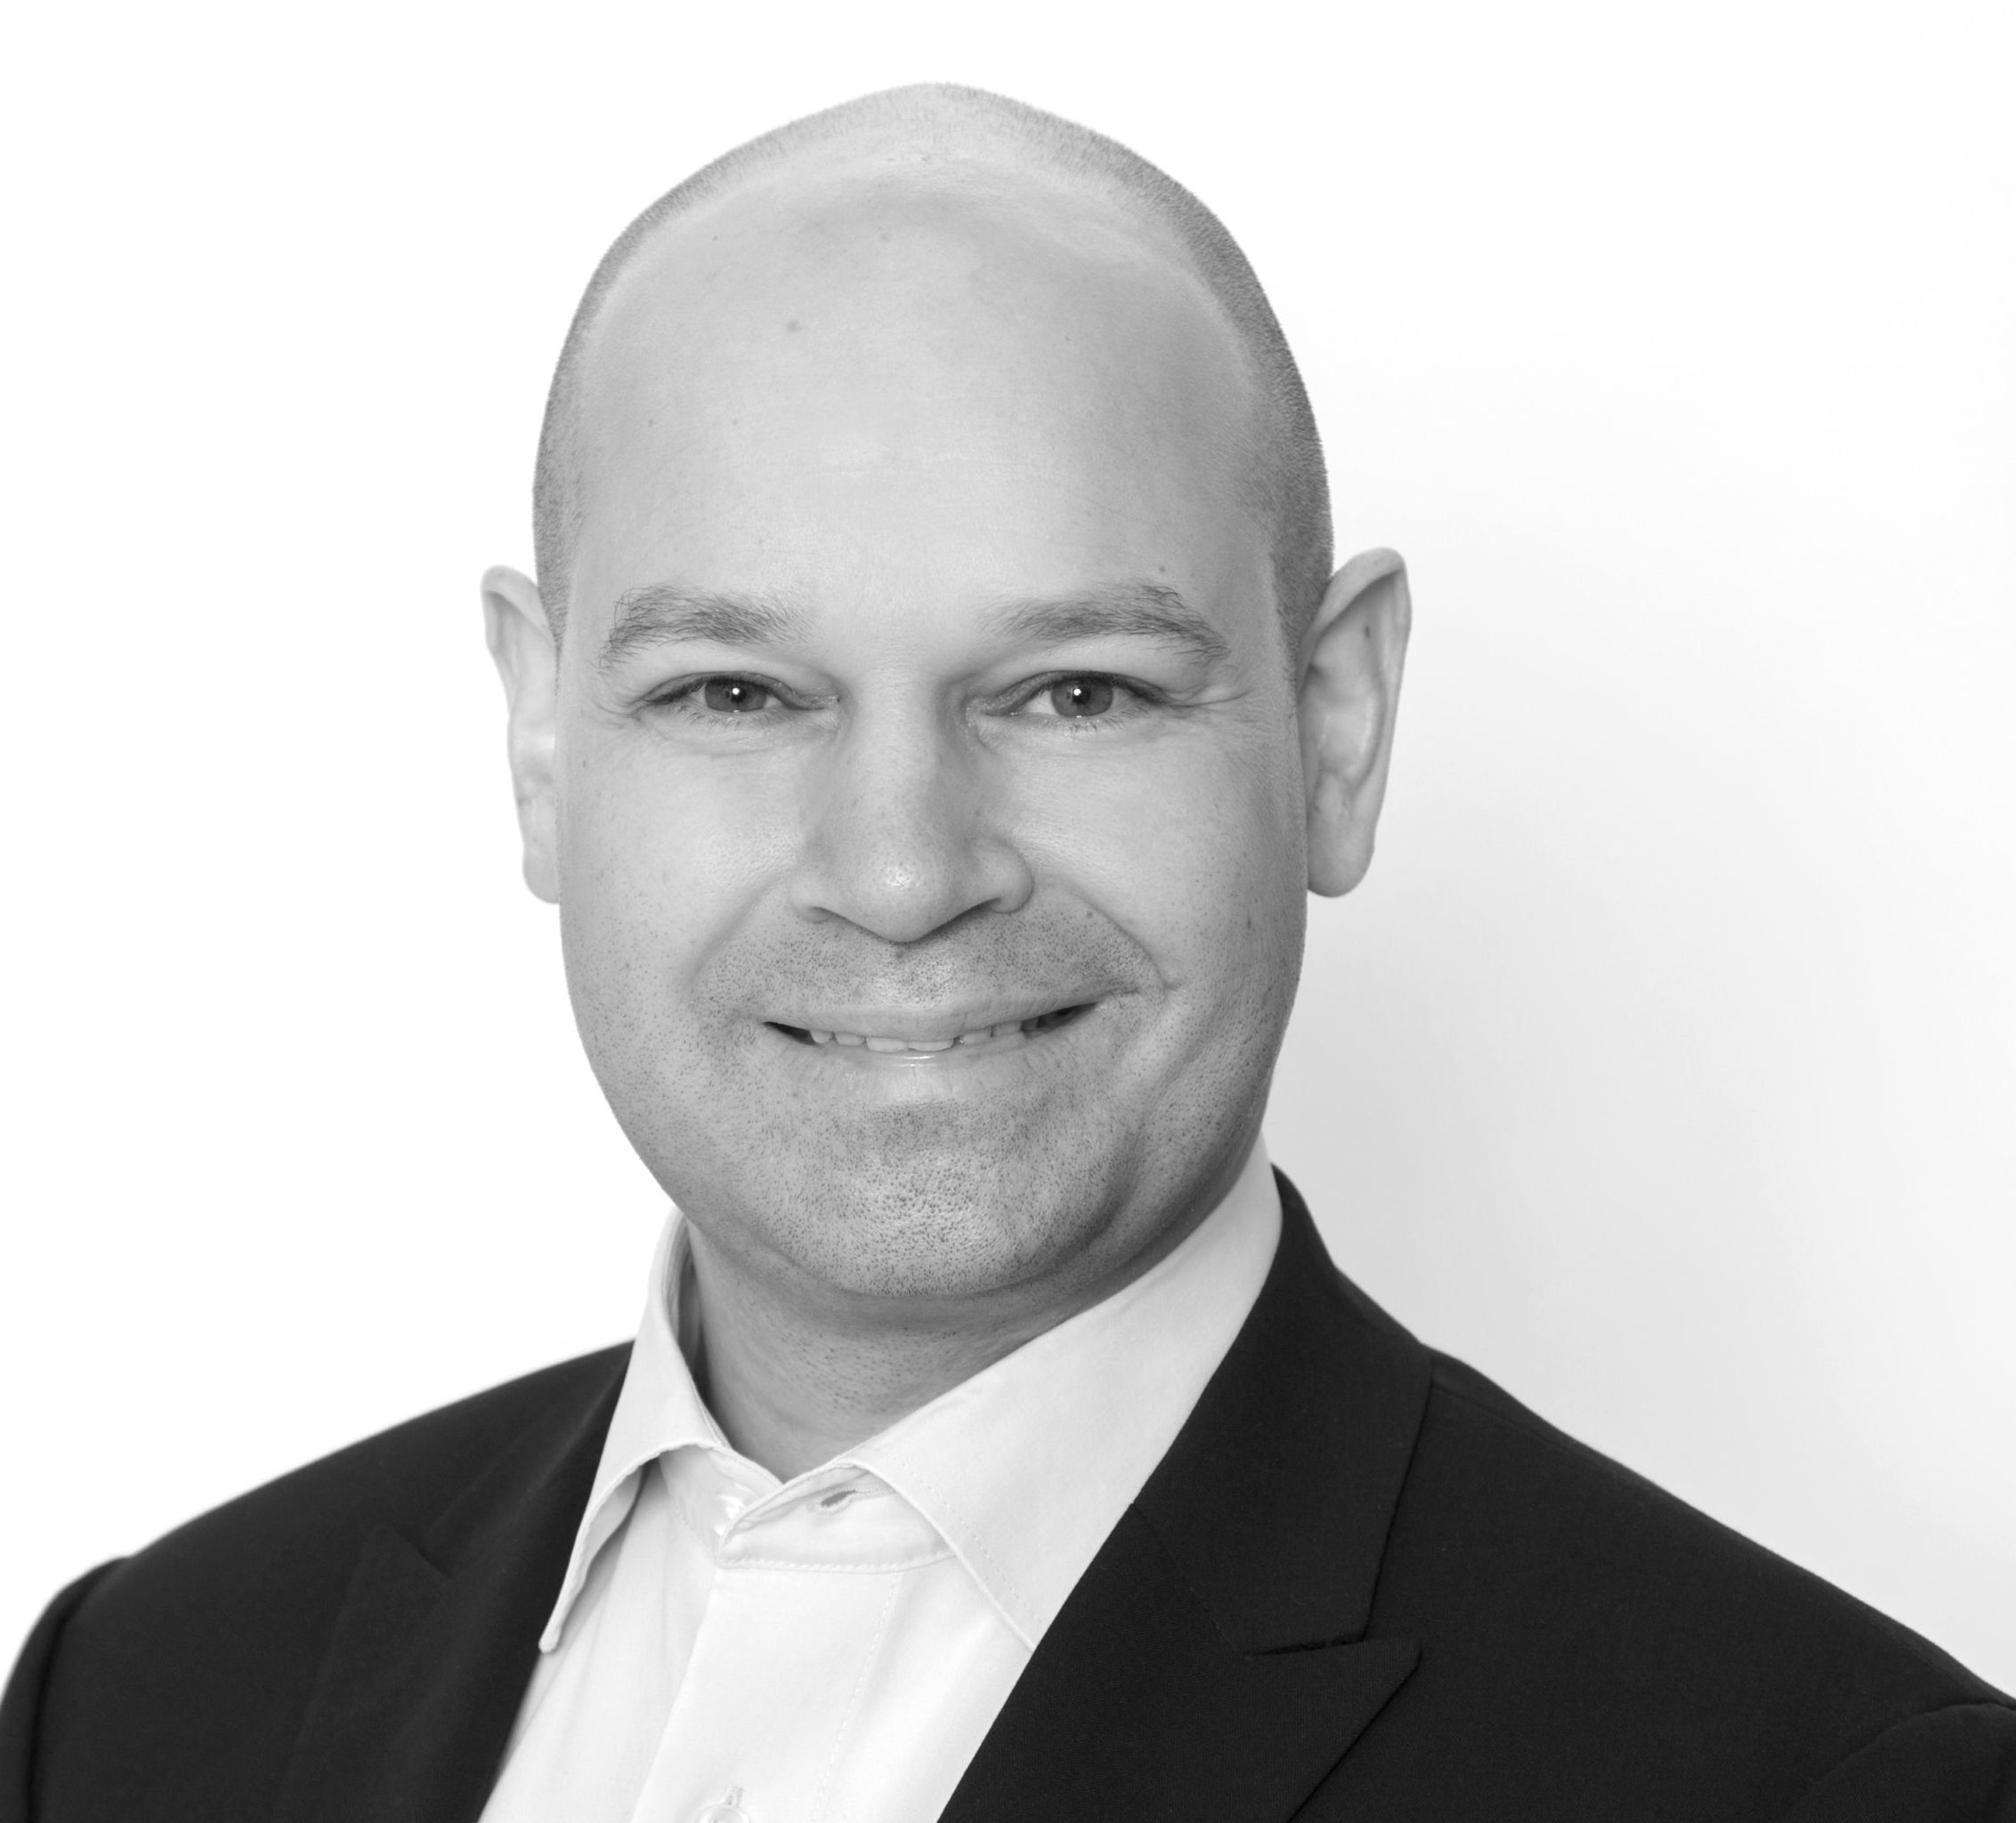 Norbert Weichele